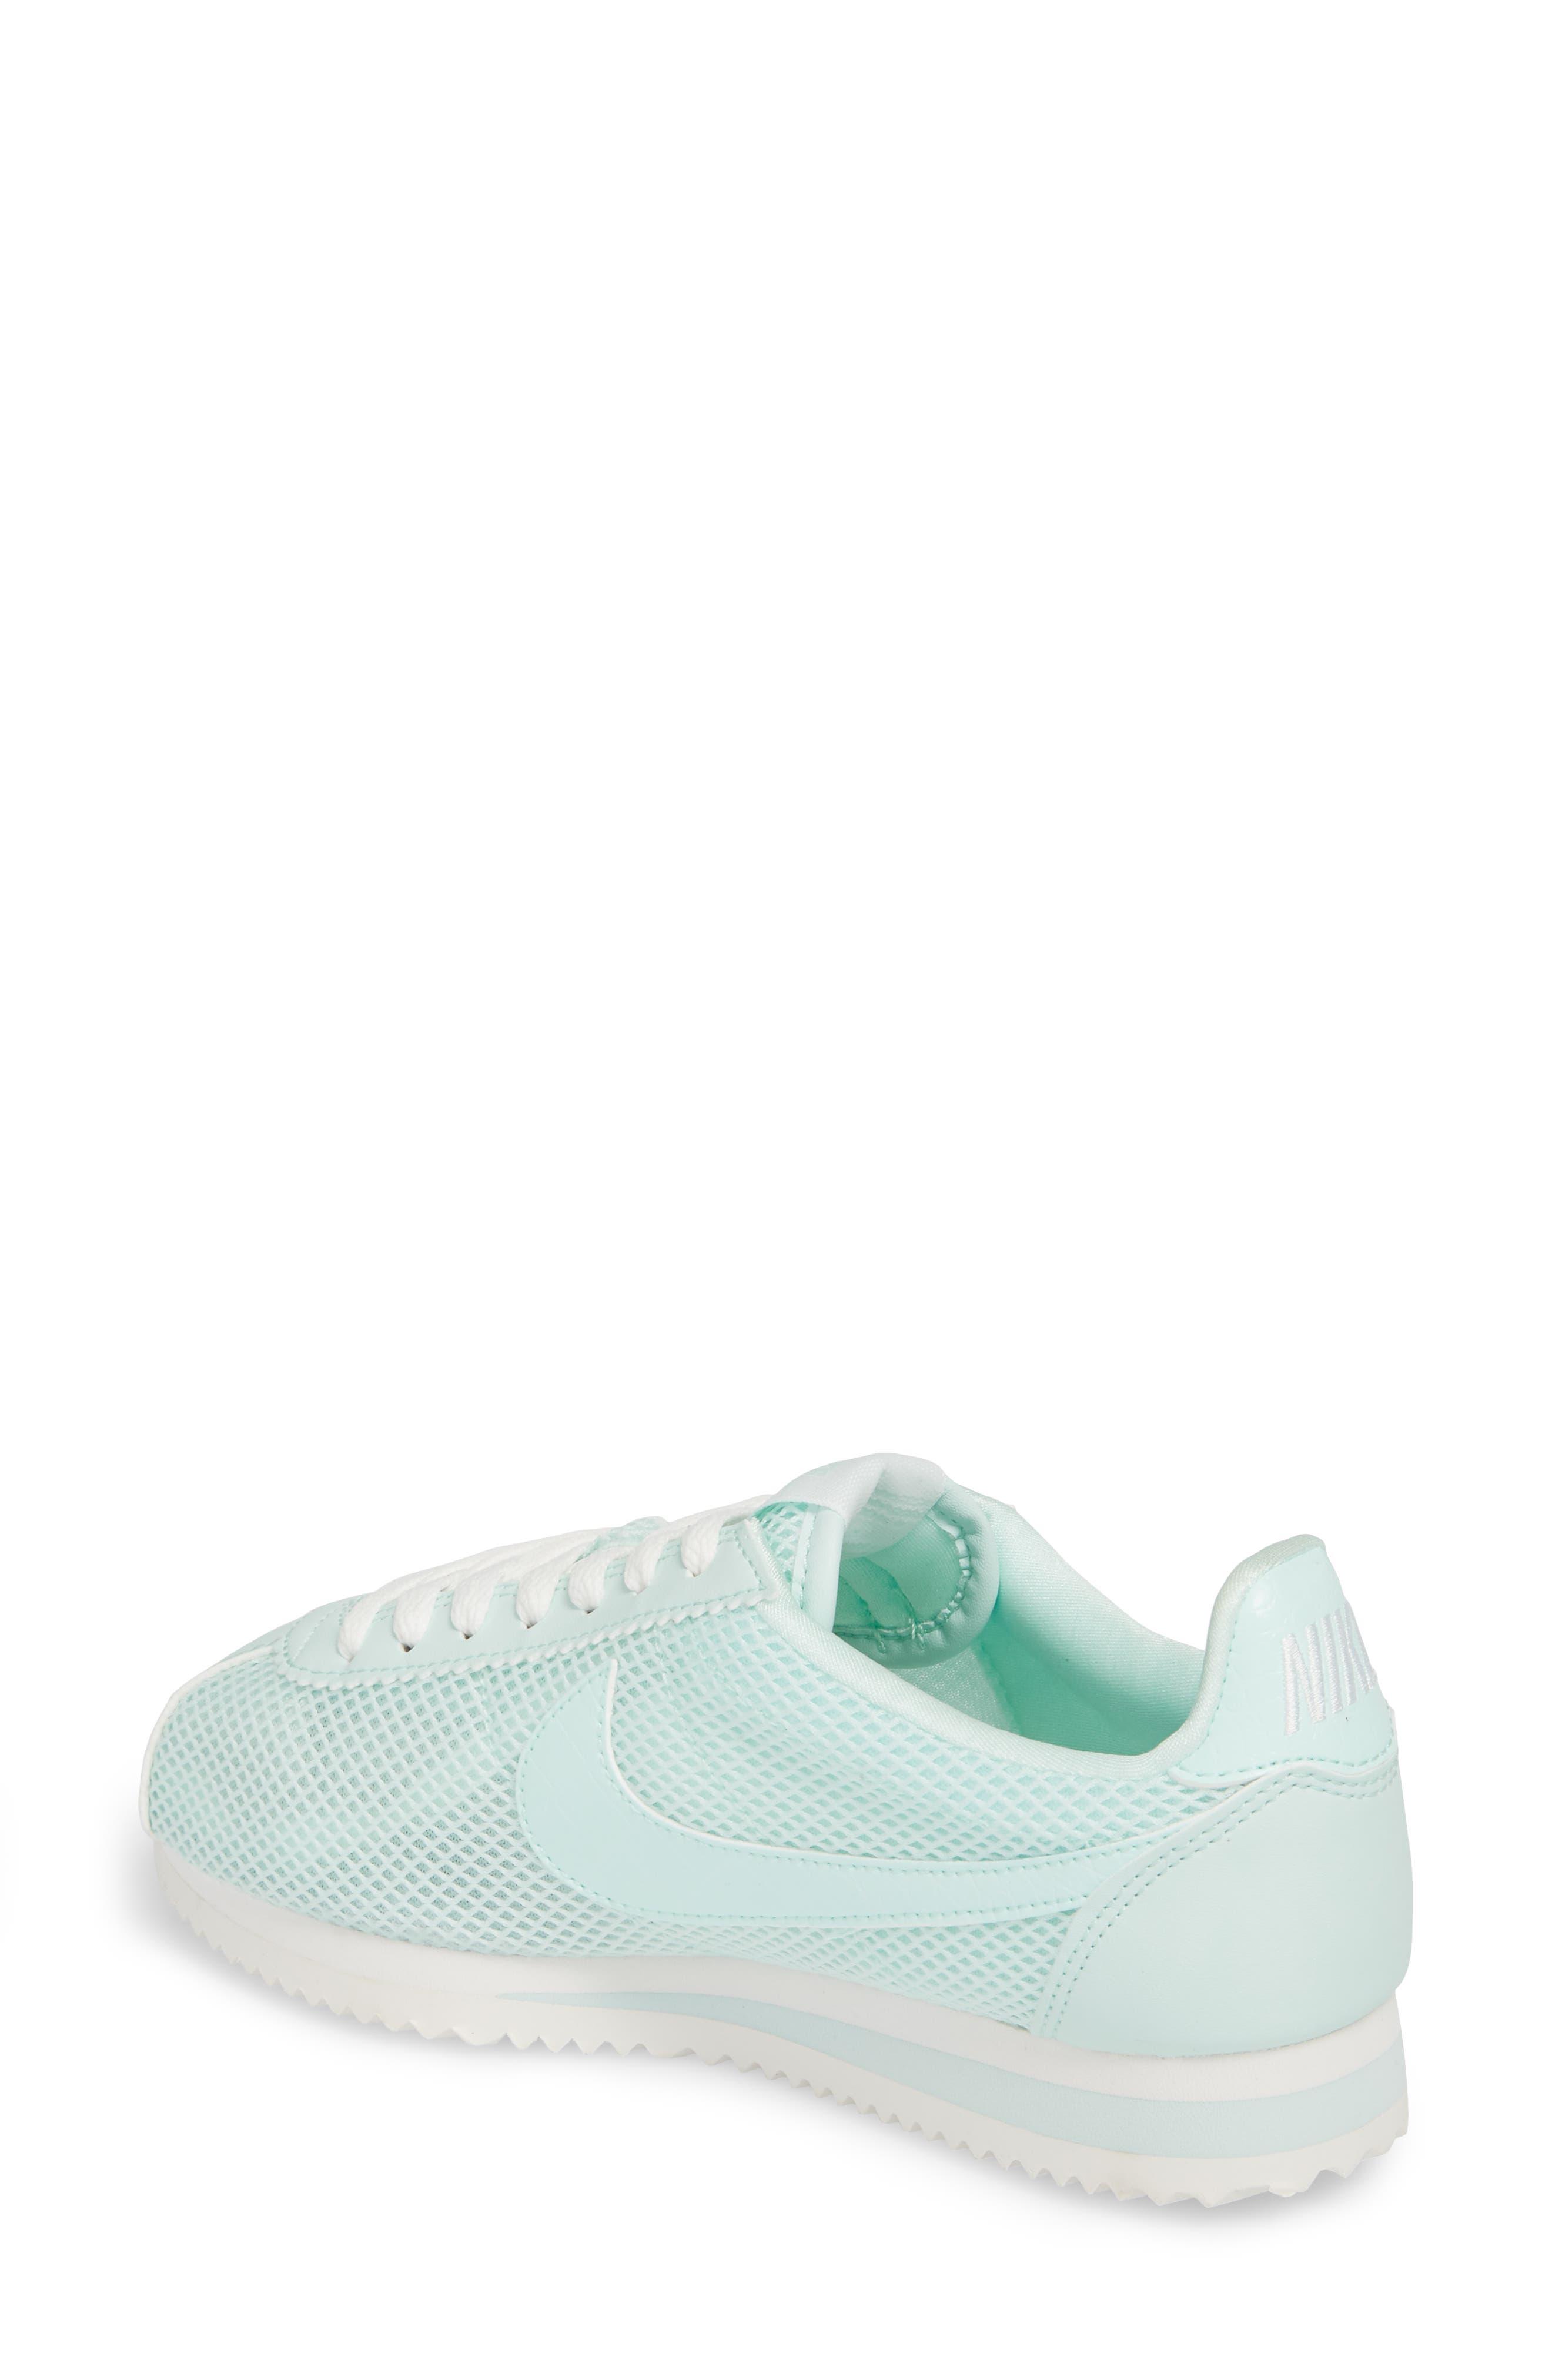 Classic Cortez Premium XLV Sneaker,                             Alternate thumbnail 2, color,                             Igloo/ Igloo/ Summit White